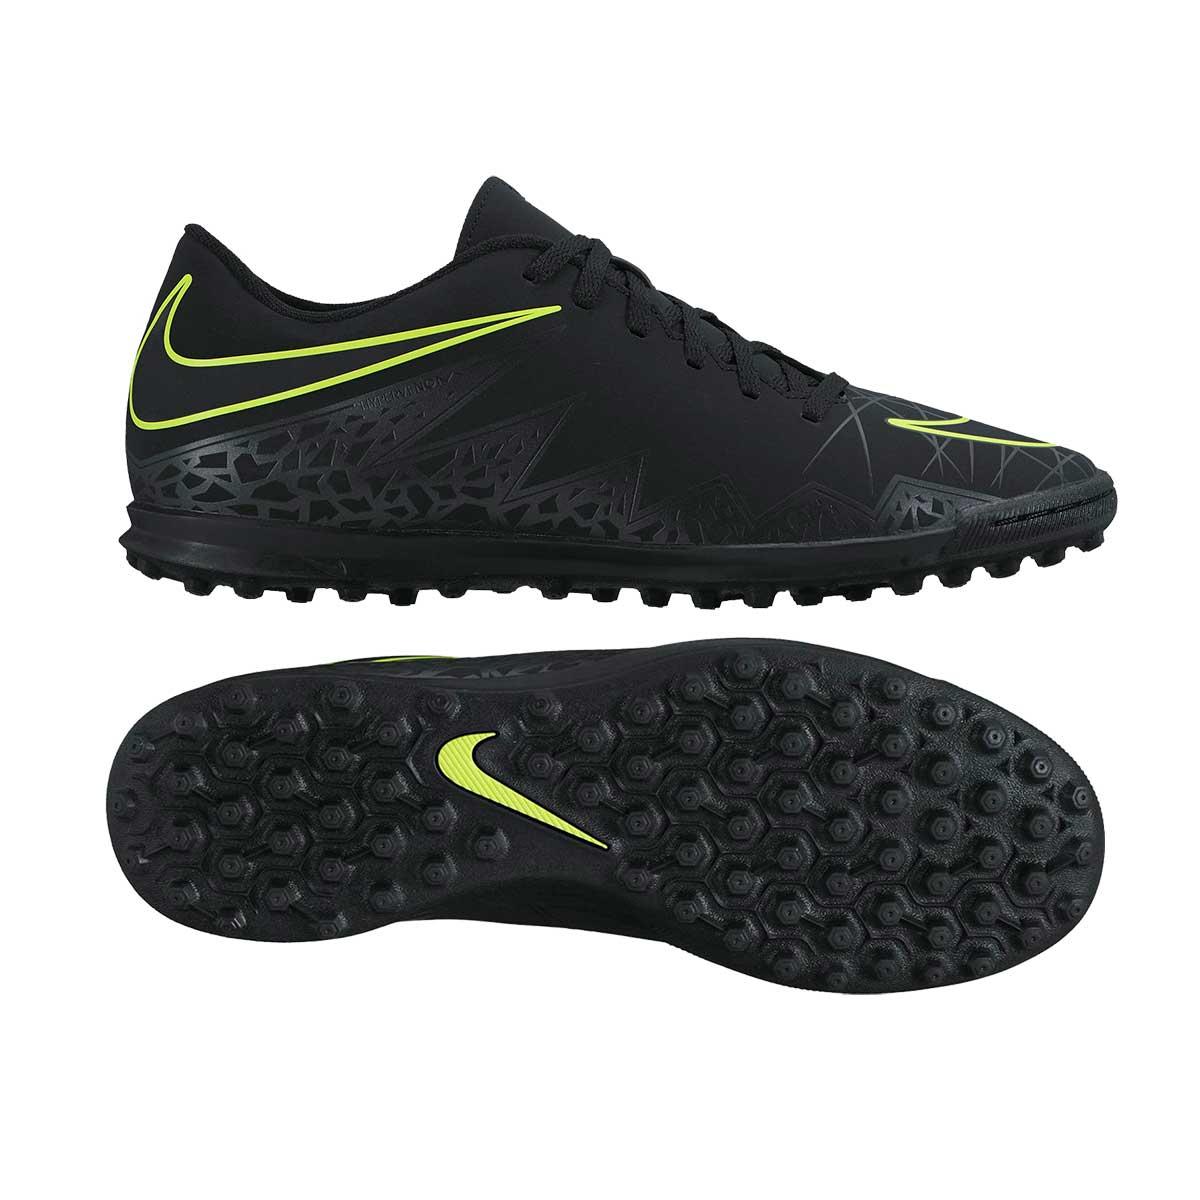 outlet store ab84d 67701 Nike Hypervenom Phade II TF Football Shoes (Black/Black Volt)